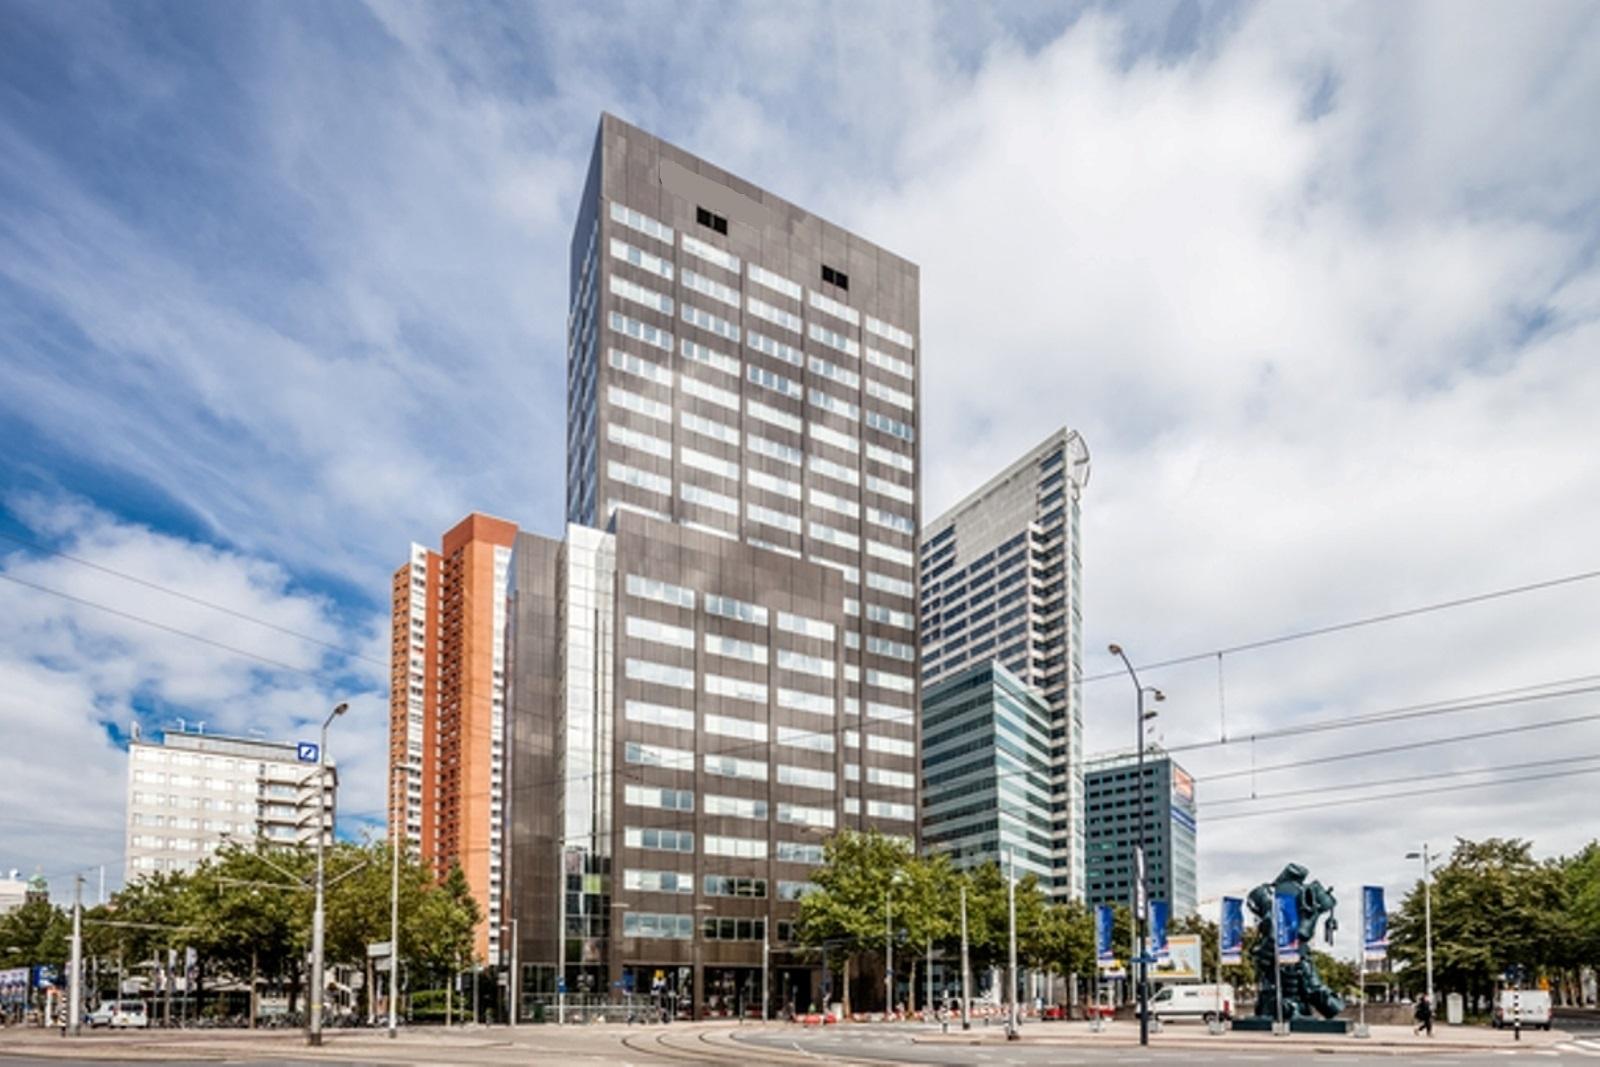 VKOZ Coolsingel 120 Rotterdam